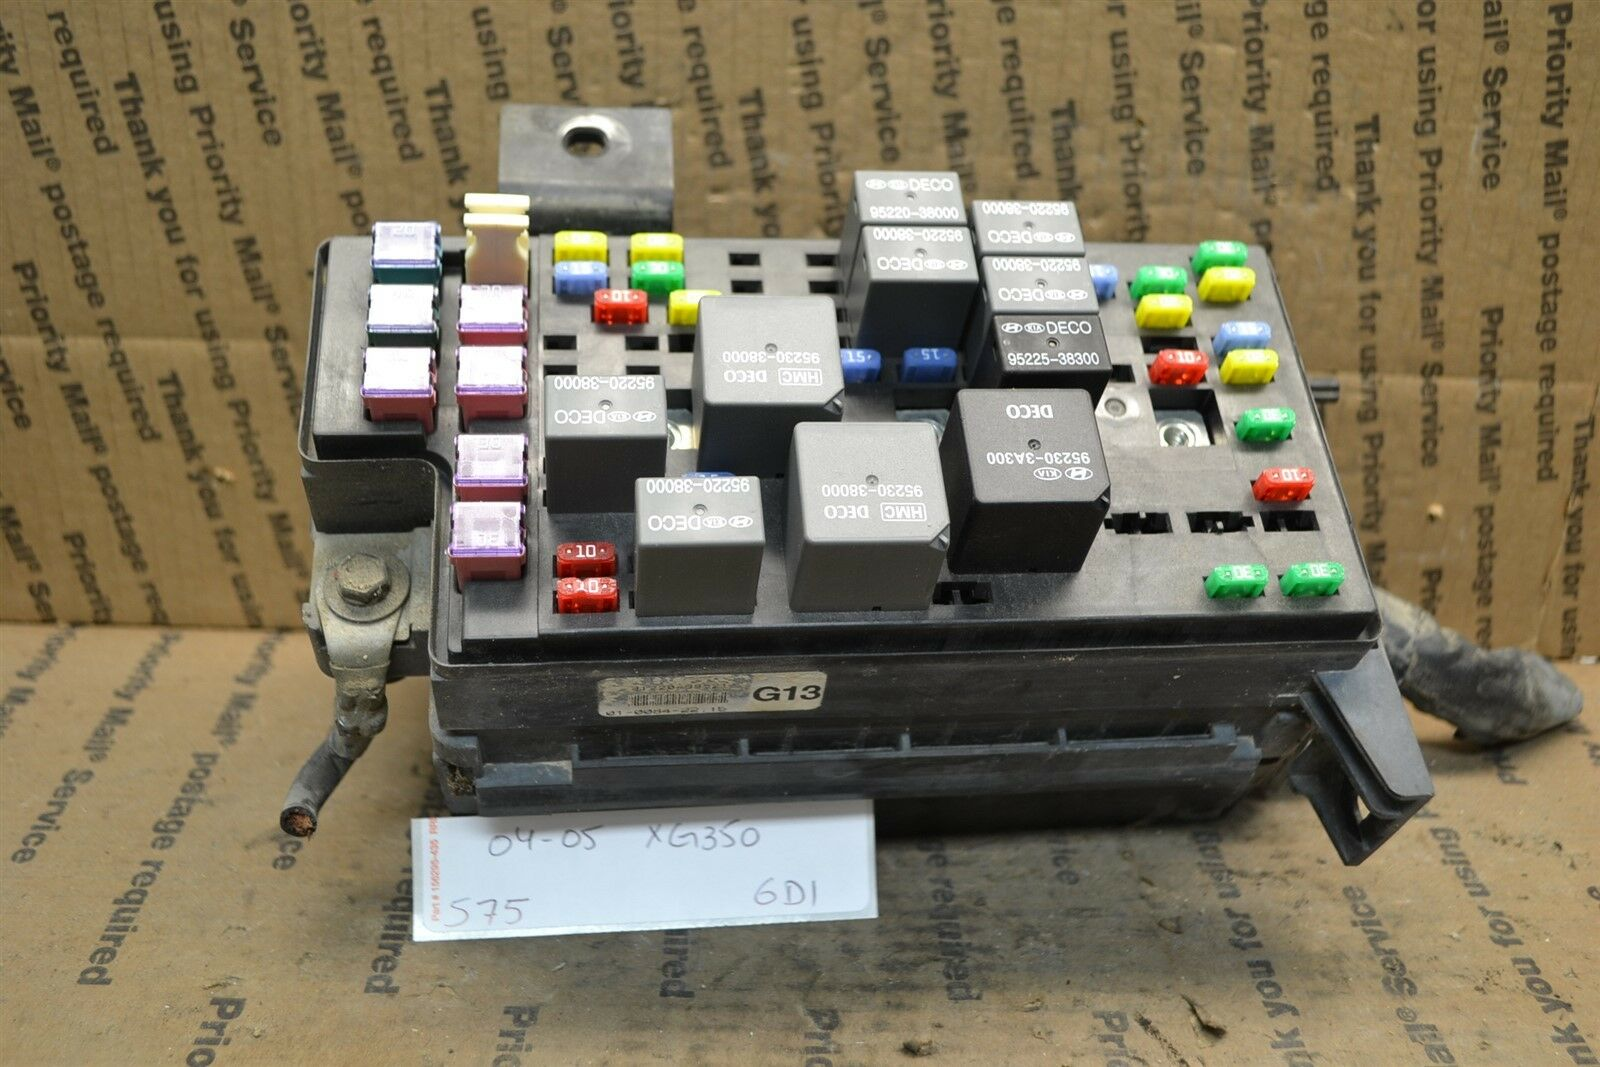 medium resolution of 2004 2005 hyundai xg350 fuse box junction oem 9122039521 module 575 6d1